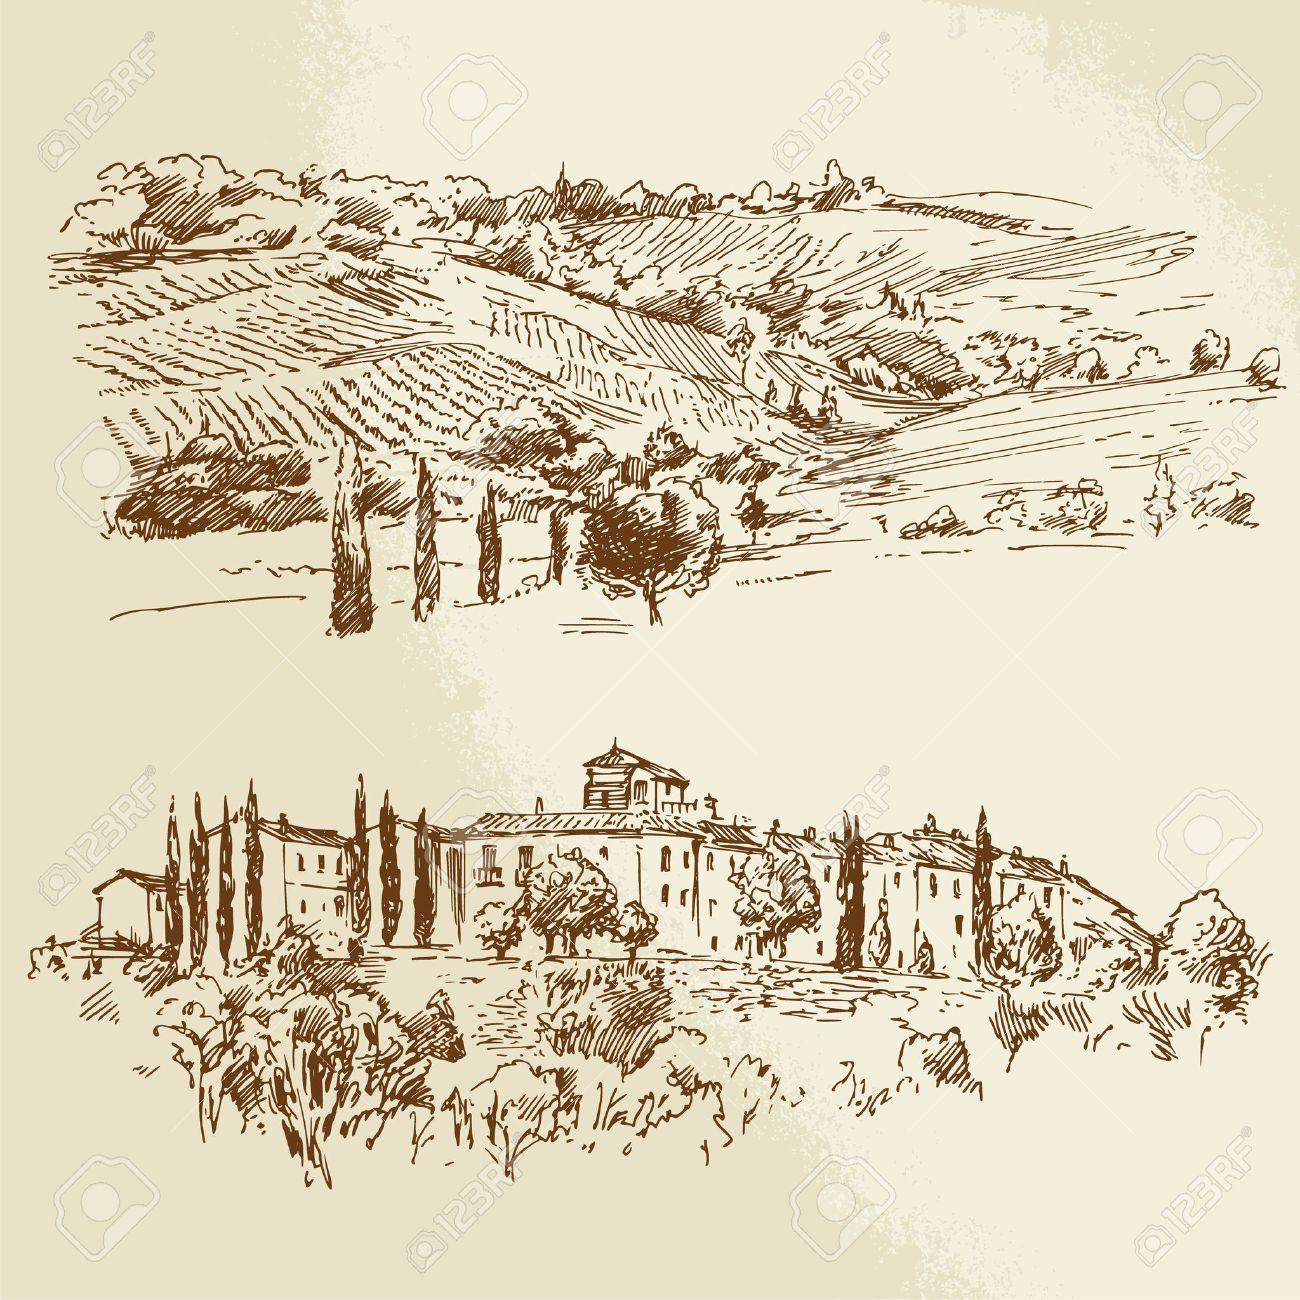 vineyard, romantic landscape - hand drawn illustration Standard-Bild - 25307611